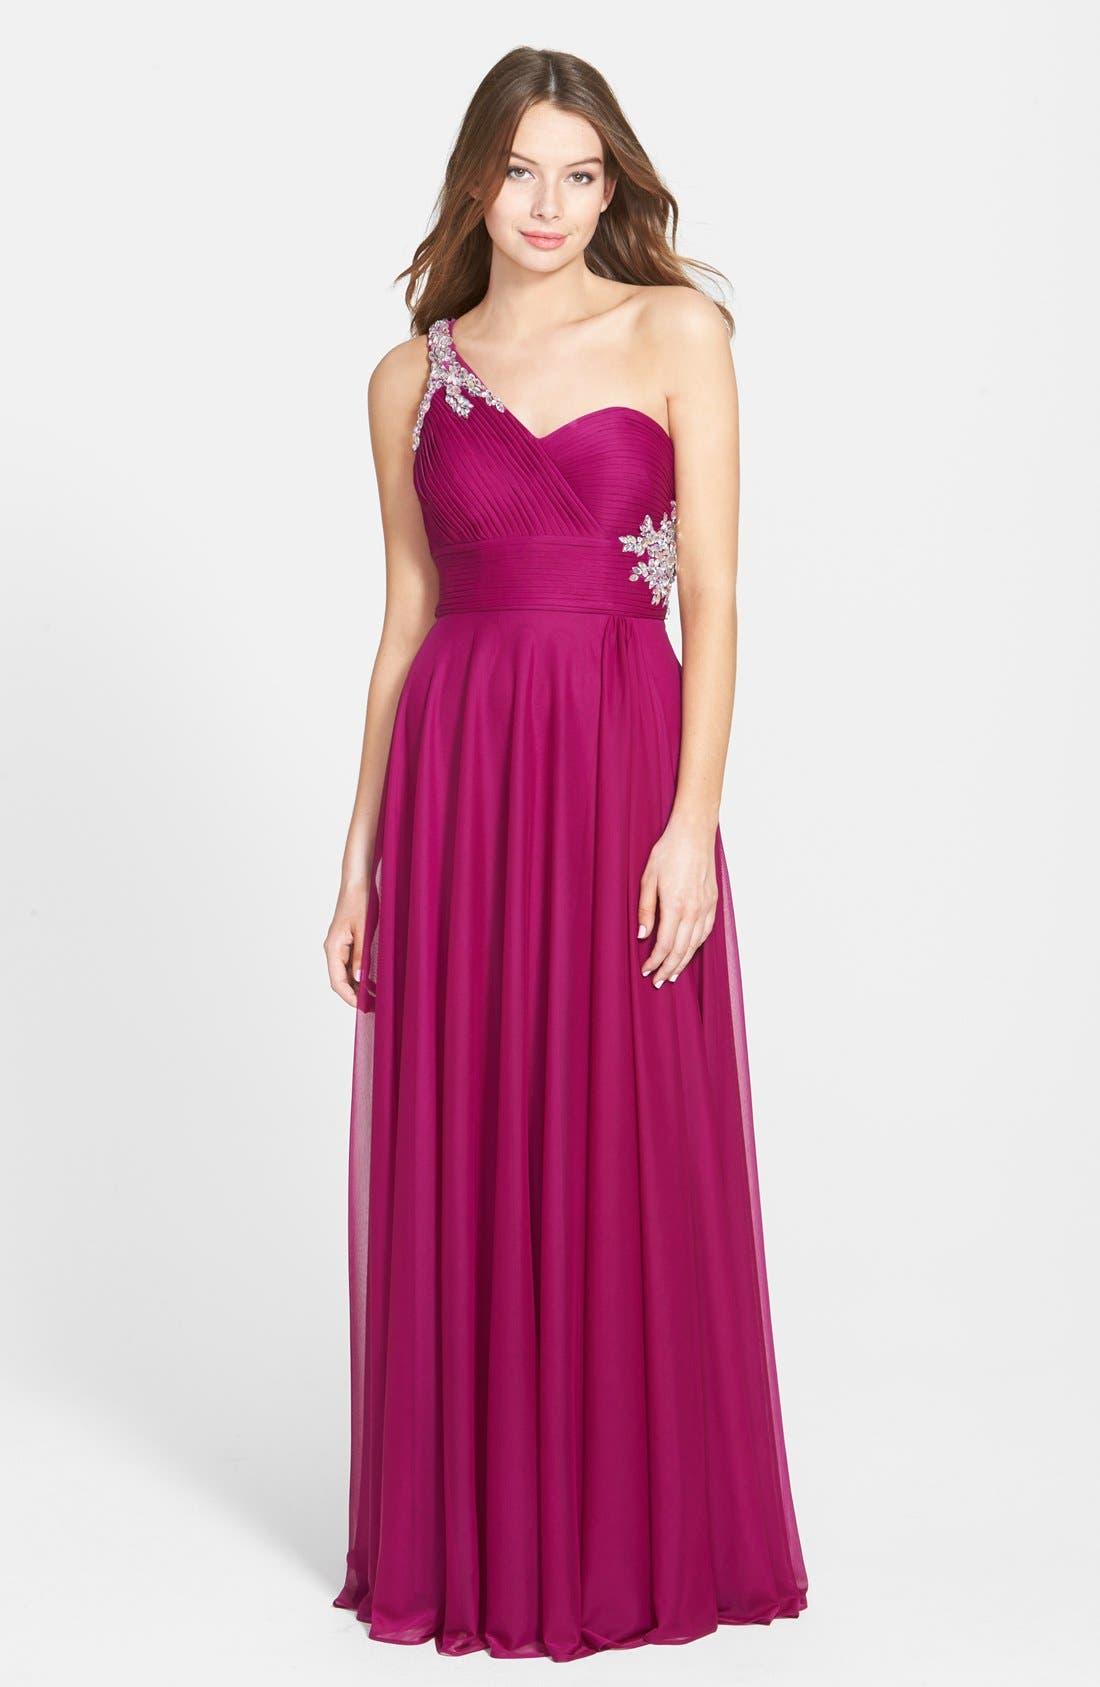 Alternate Image 1 Selected - Xscape Embellished One Shoulder Mesh Gown